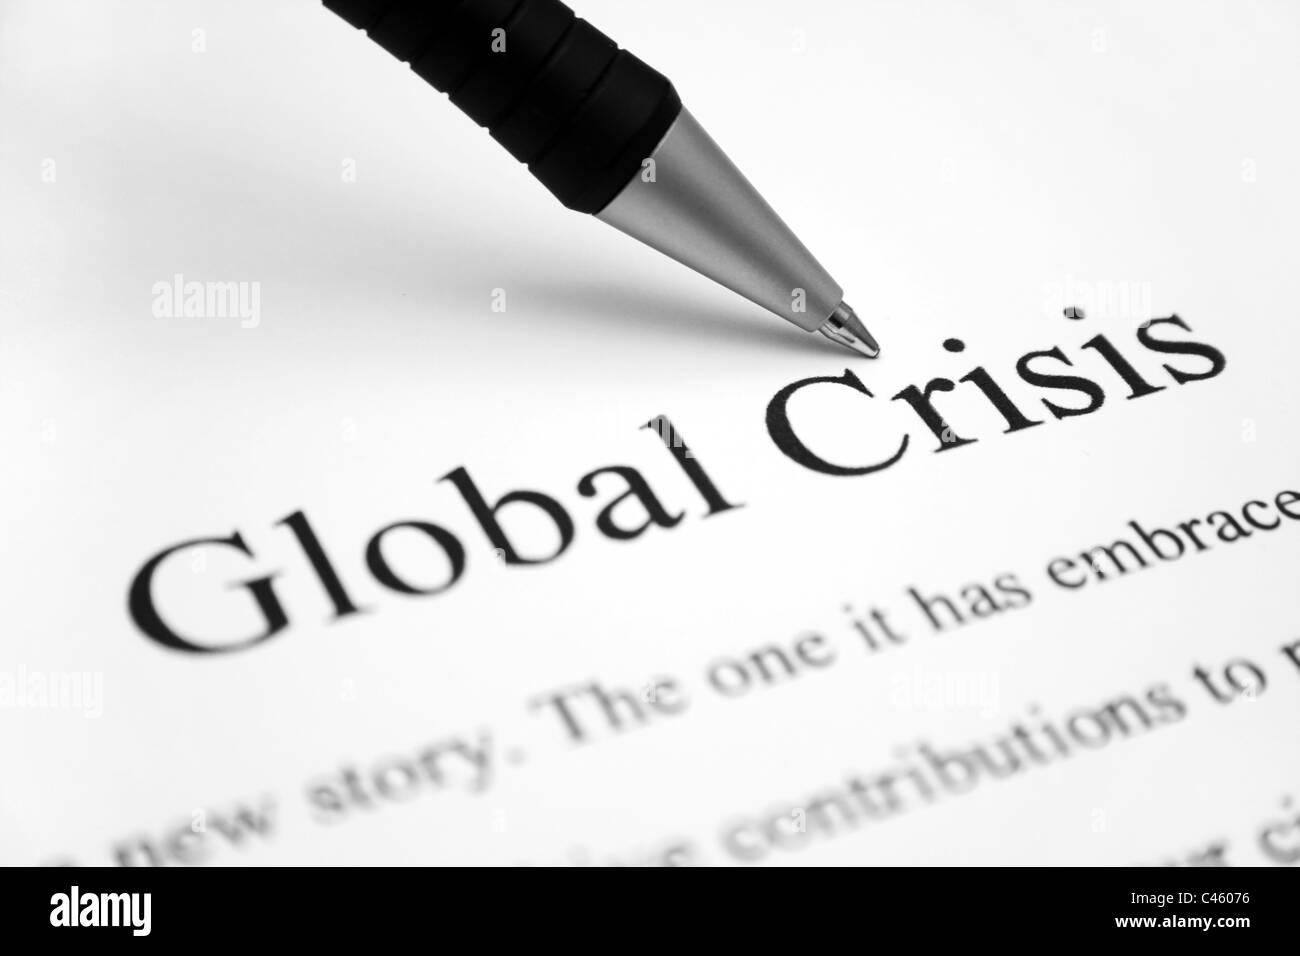 Global financial crisis - Stock Image